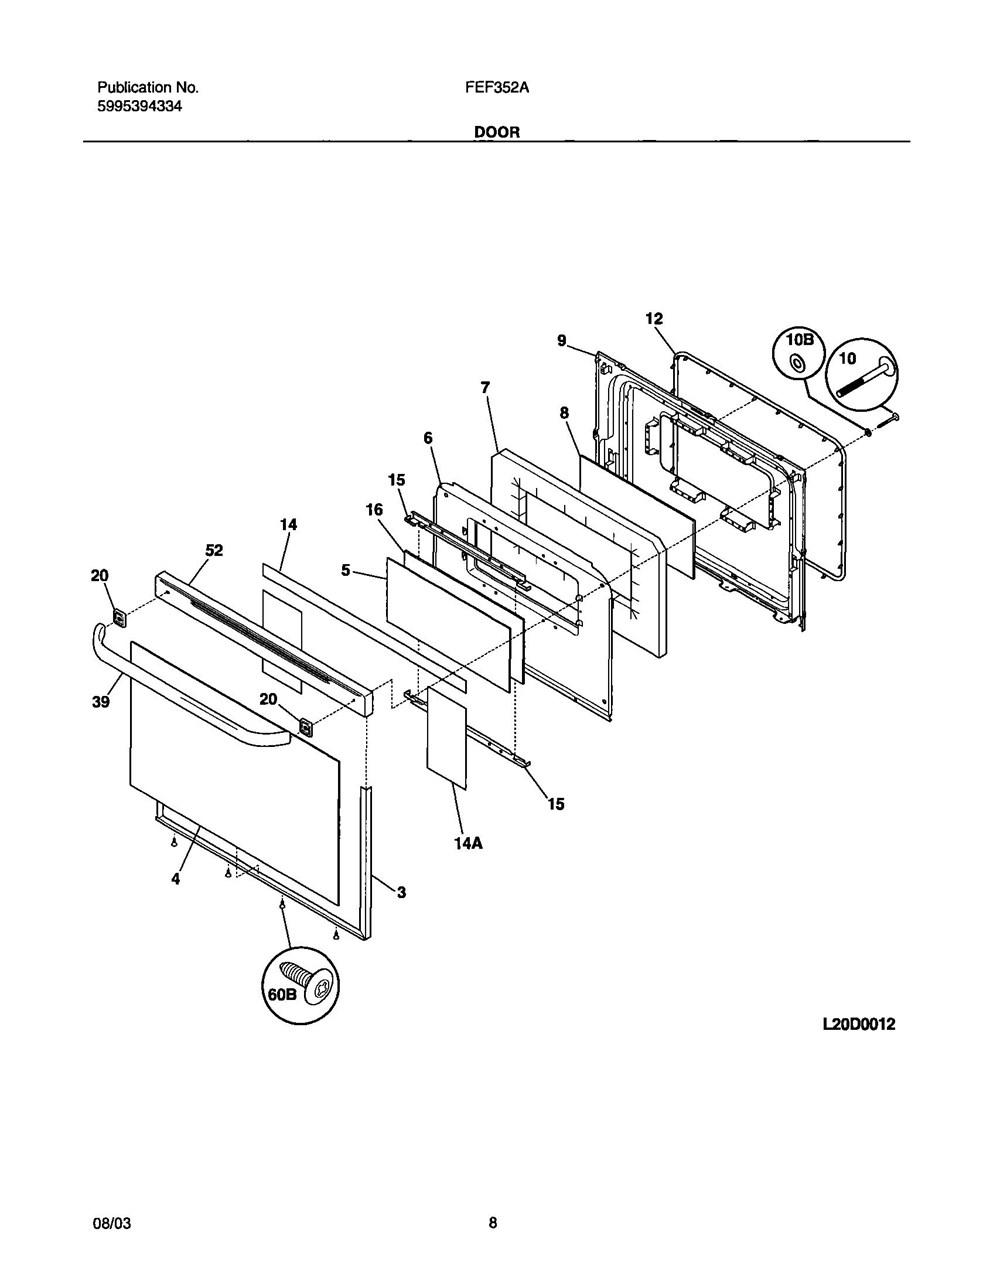 Fef352auf Frigidaire Company 07top Drawer 09door 01cover 10wiring Diagram 11wiring